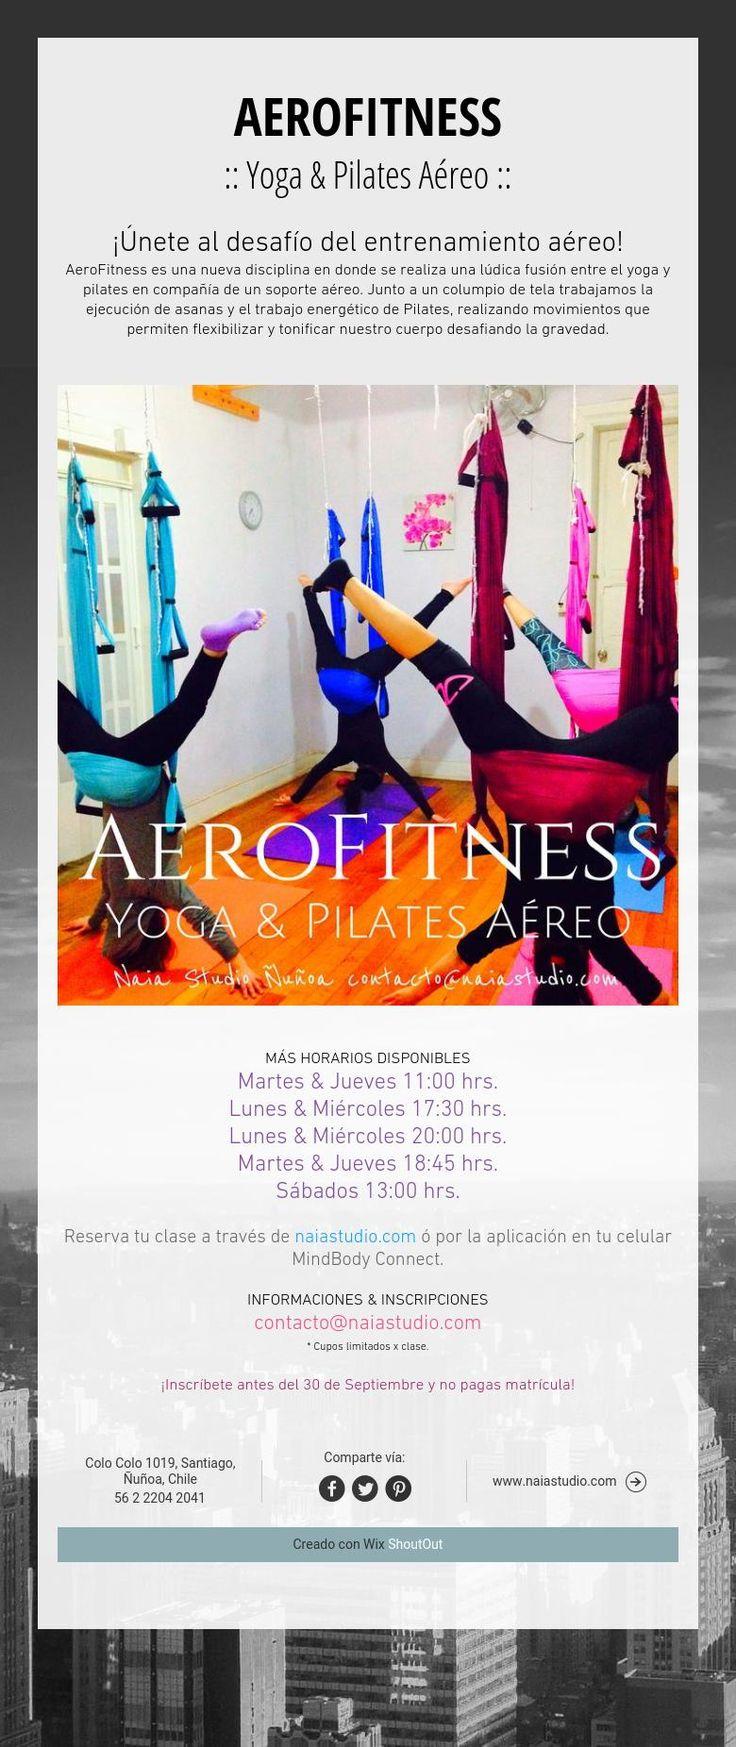 AEROFITNESS :: Yoga & Pilates Aéreo ::